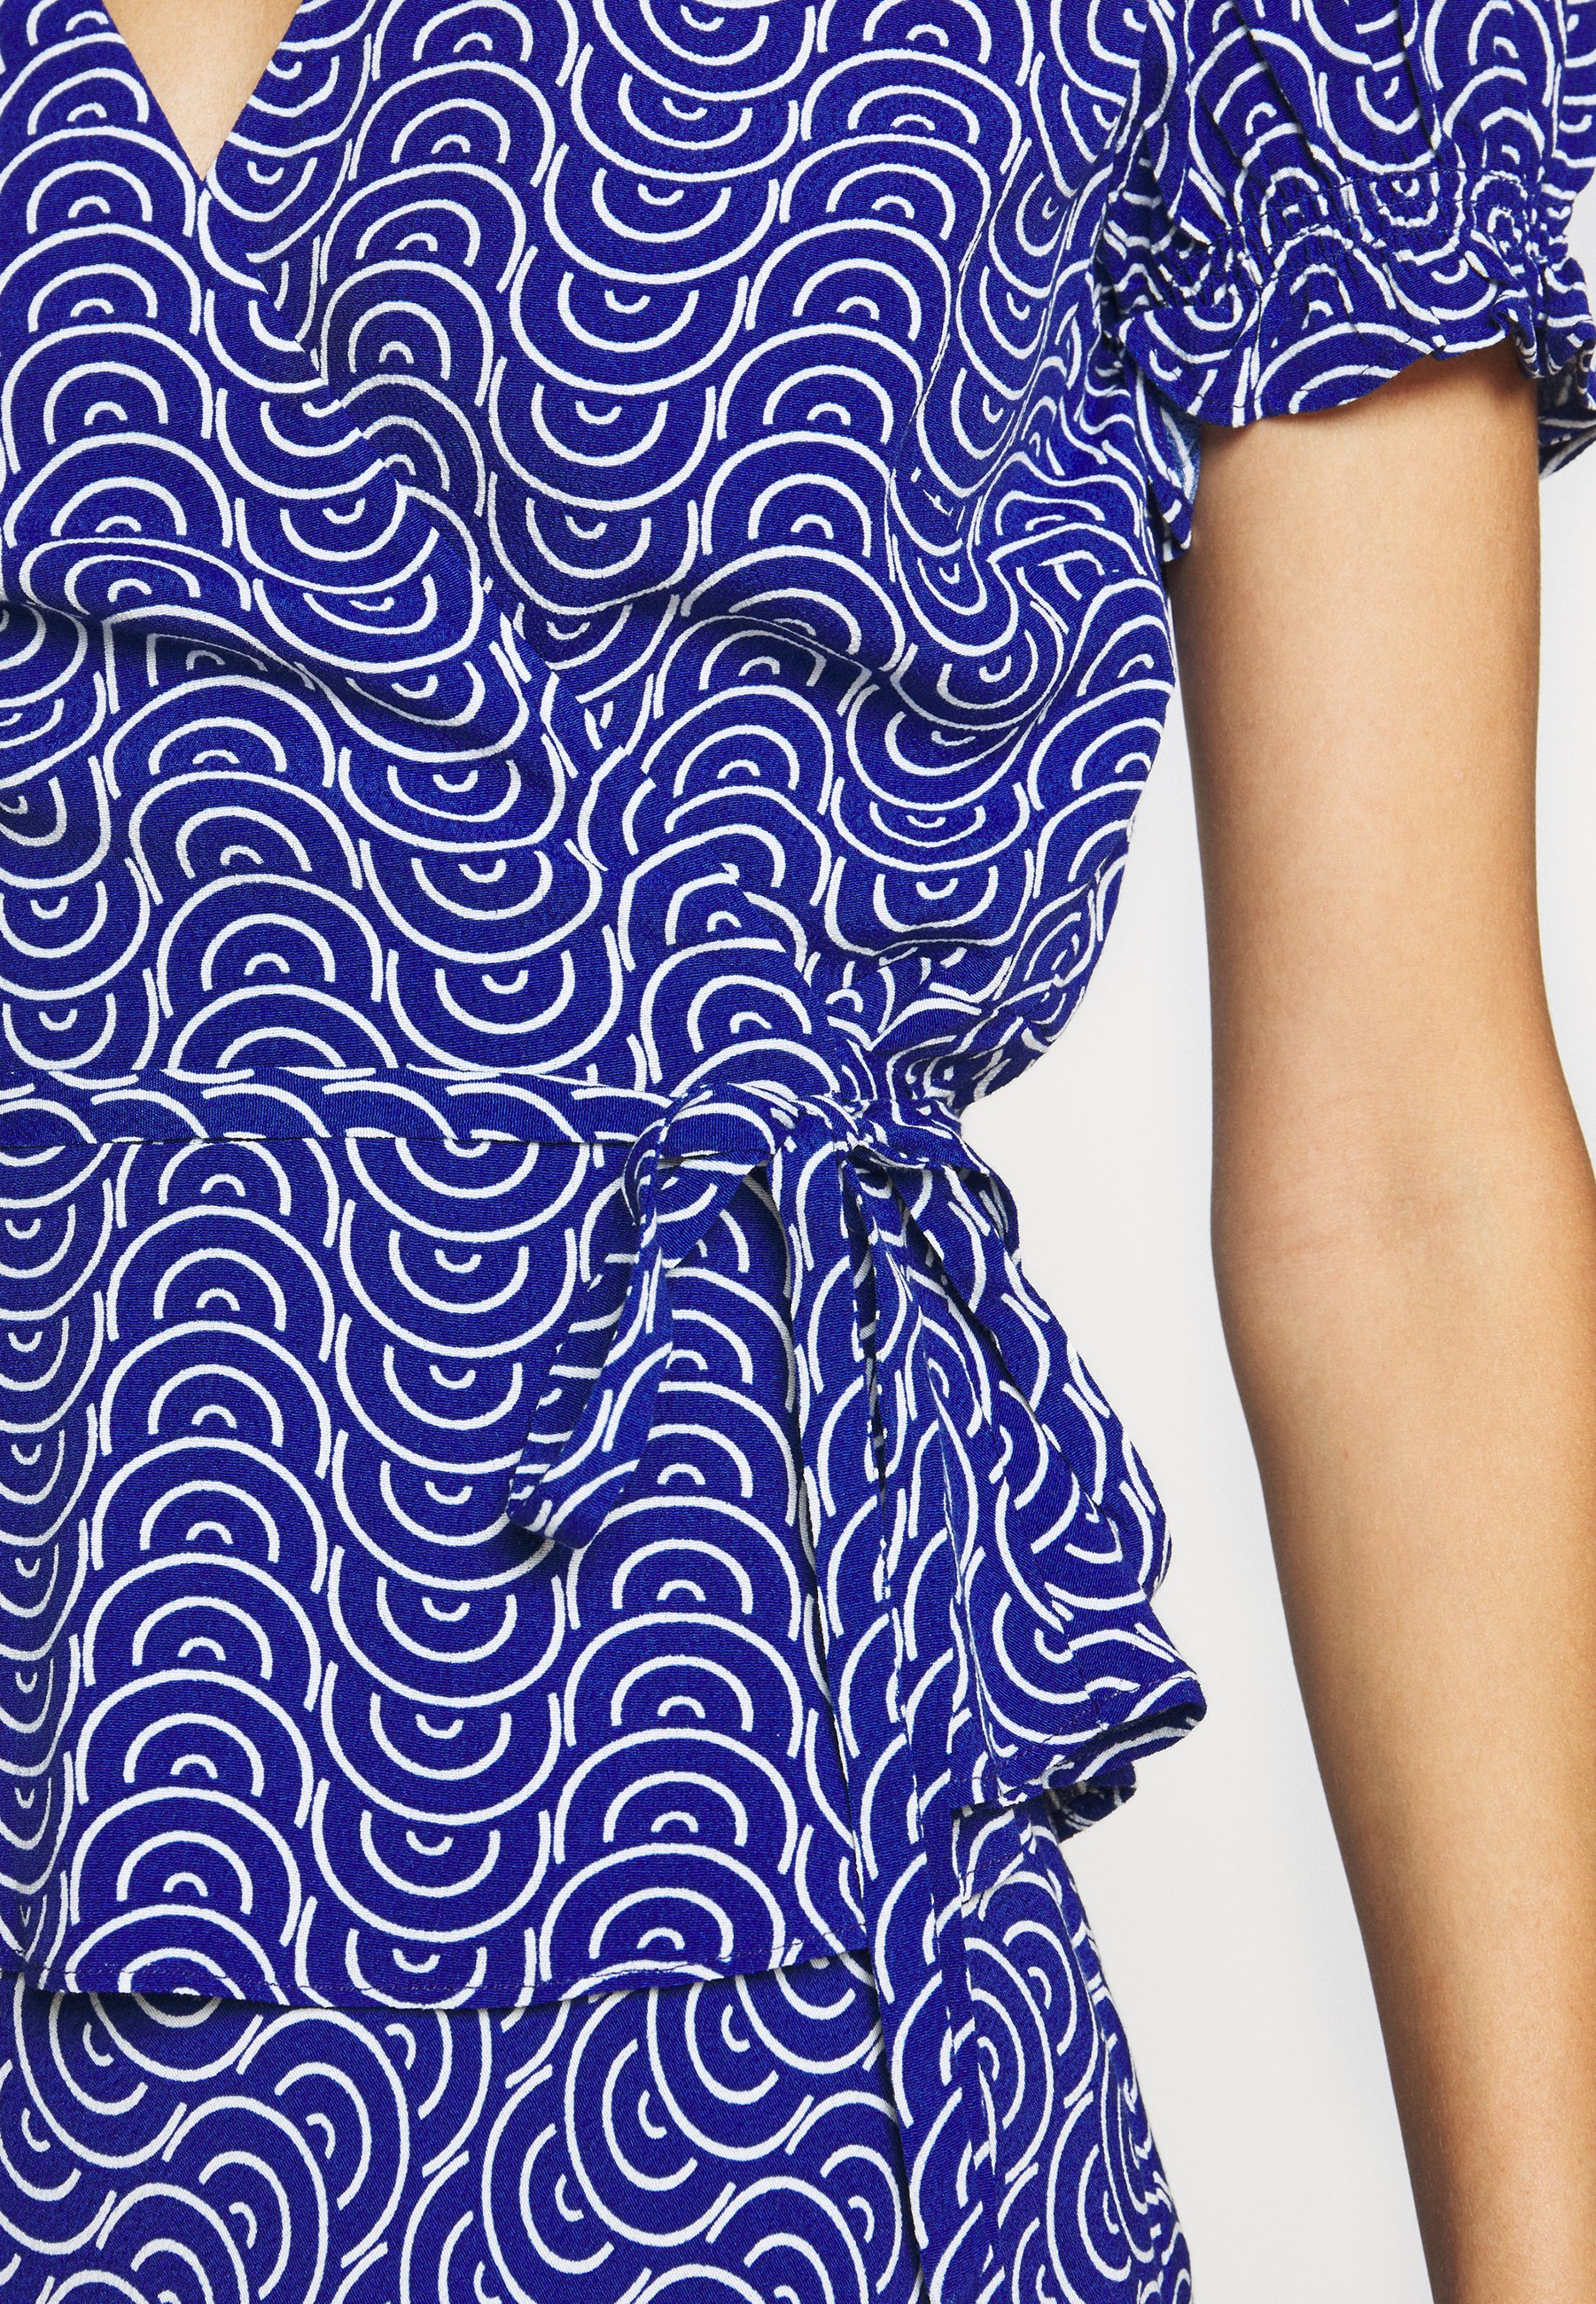 Cut-Price Fashionable Women's Clothing Diane von Furstenberg EMILIA Blouse blue QrbYbaSma IJfYi4pMI